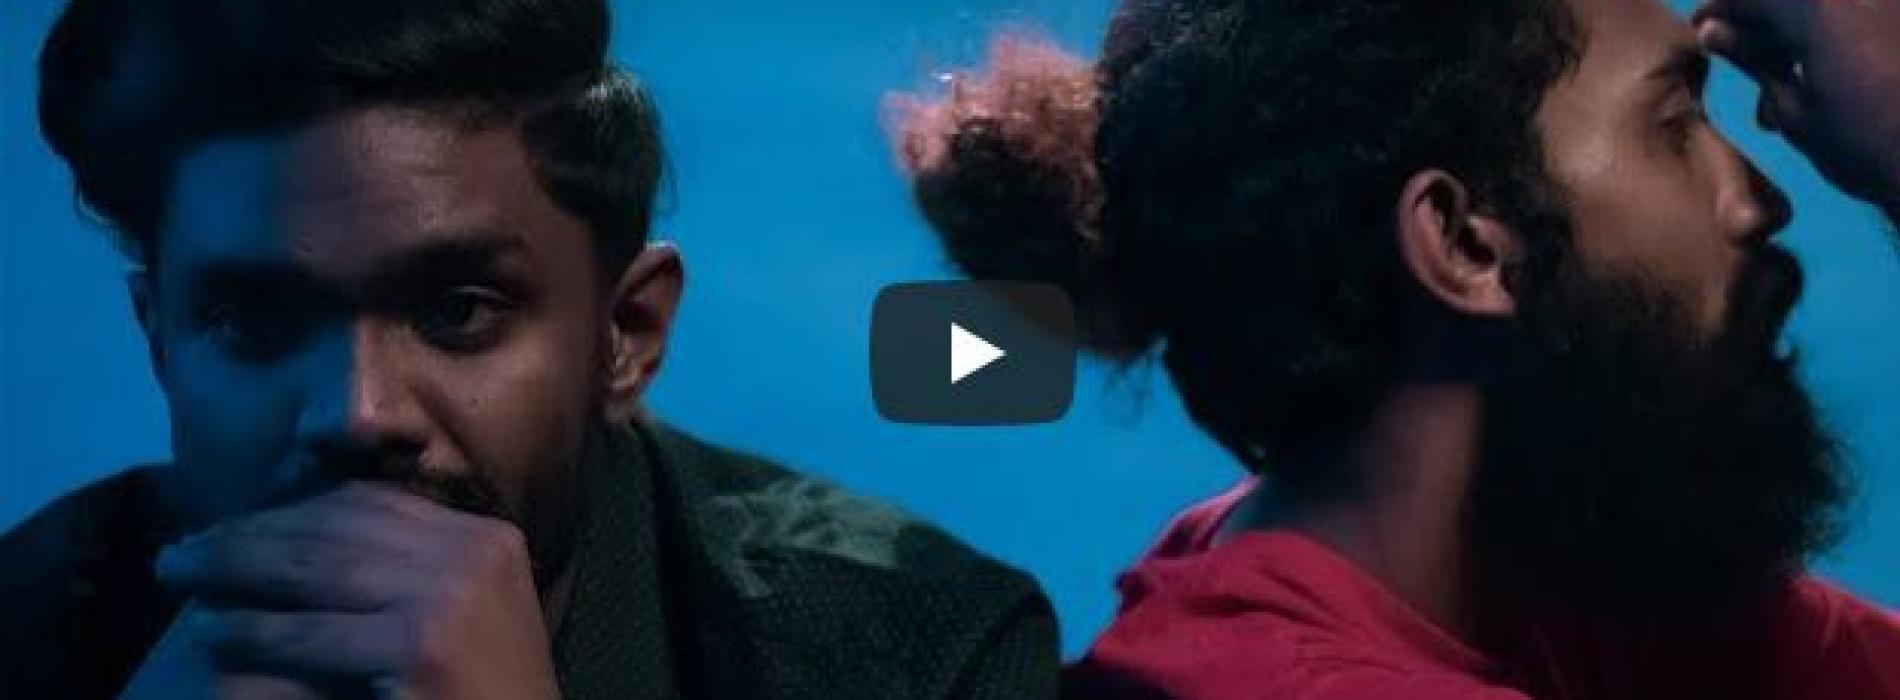 New Music : Wagmee – Sitha Thamath Ft Adeesha Beats (Music Video)